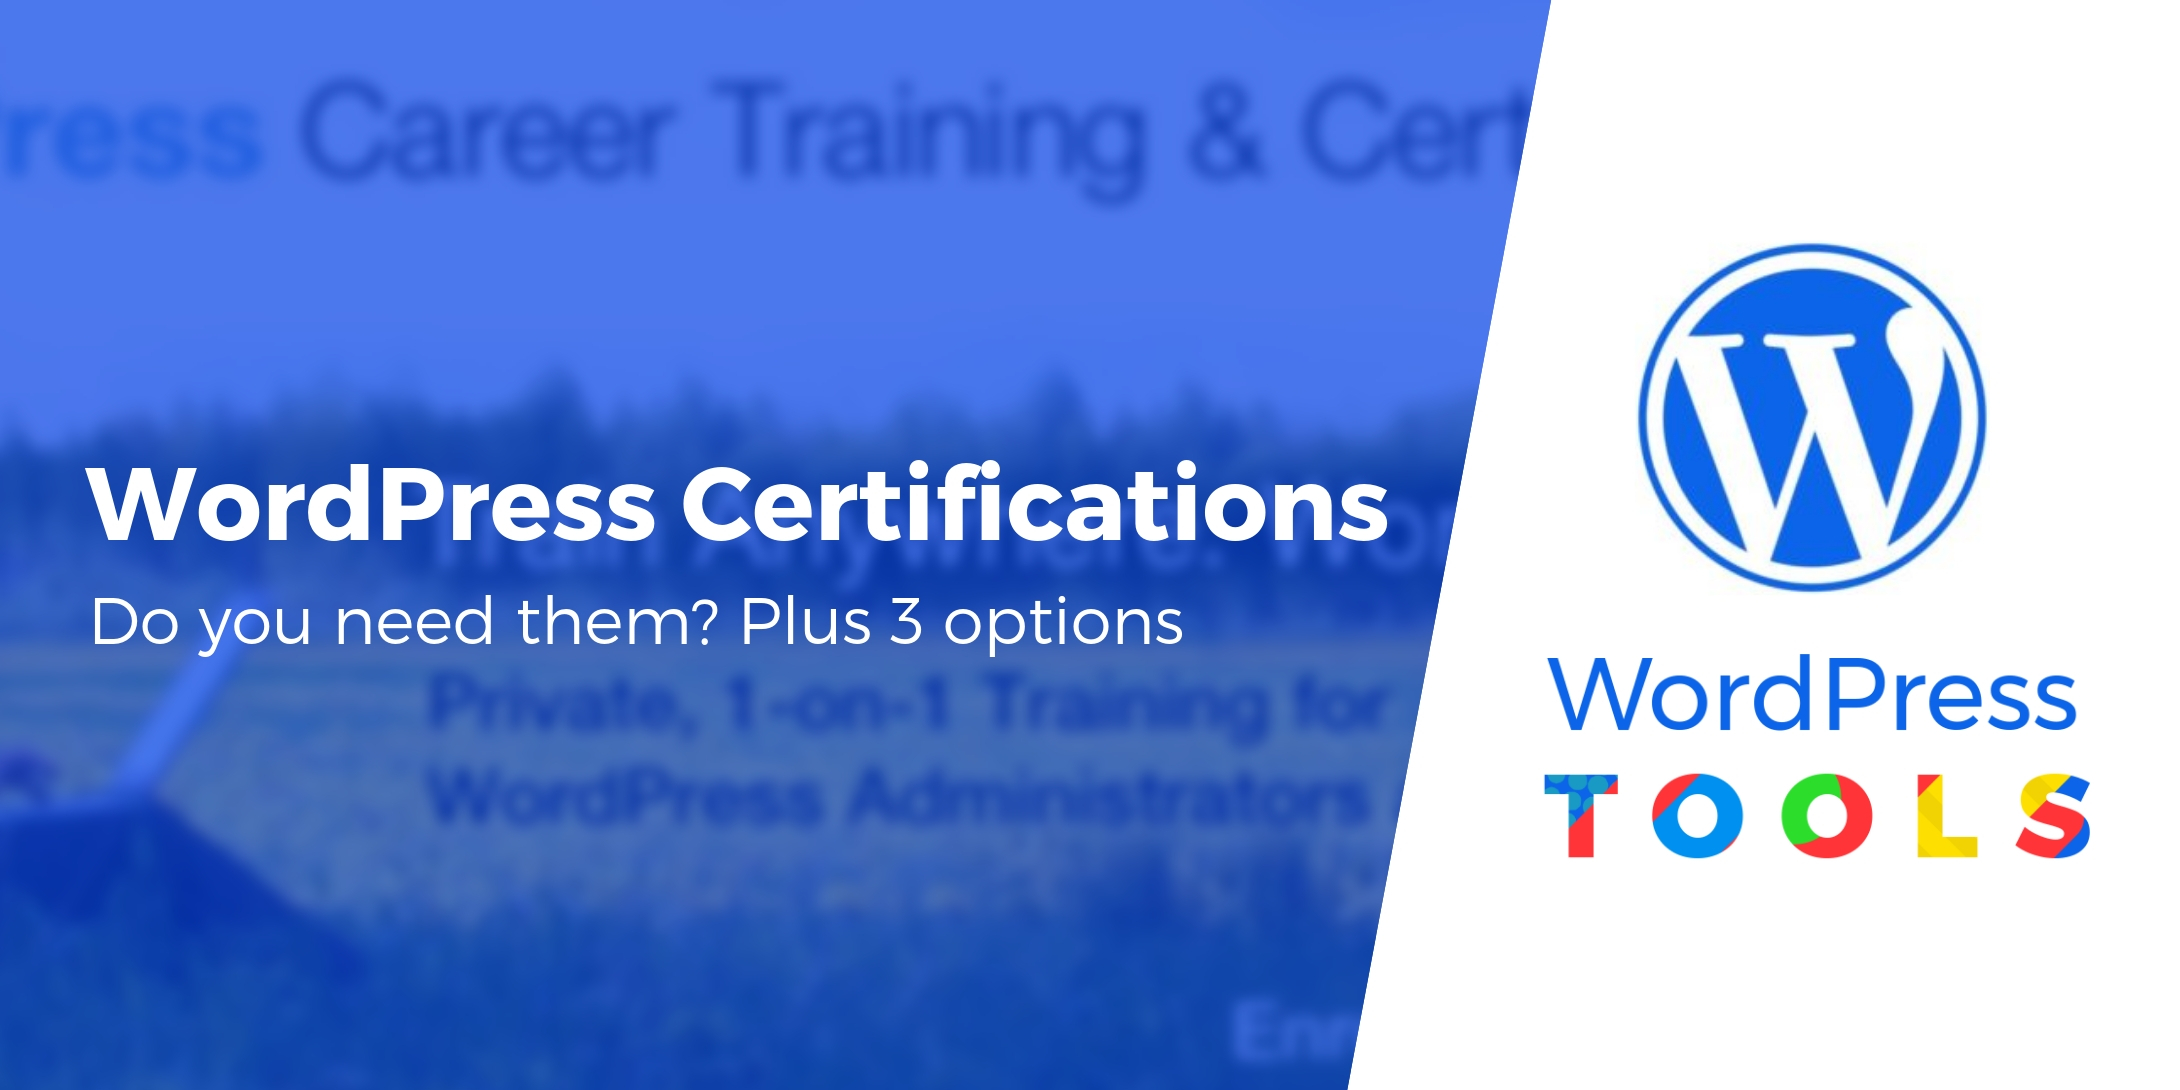 WordPress Certifications